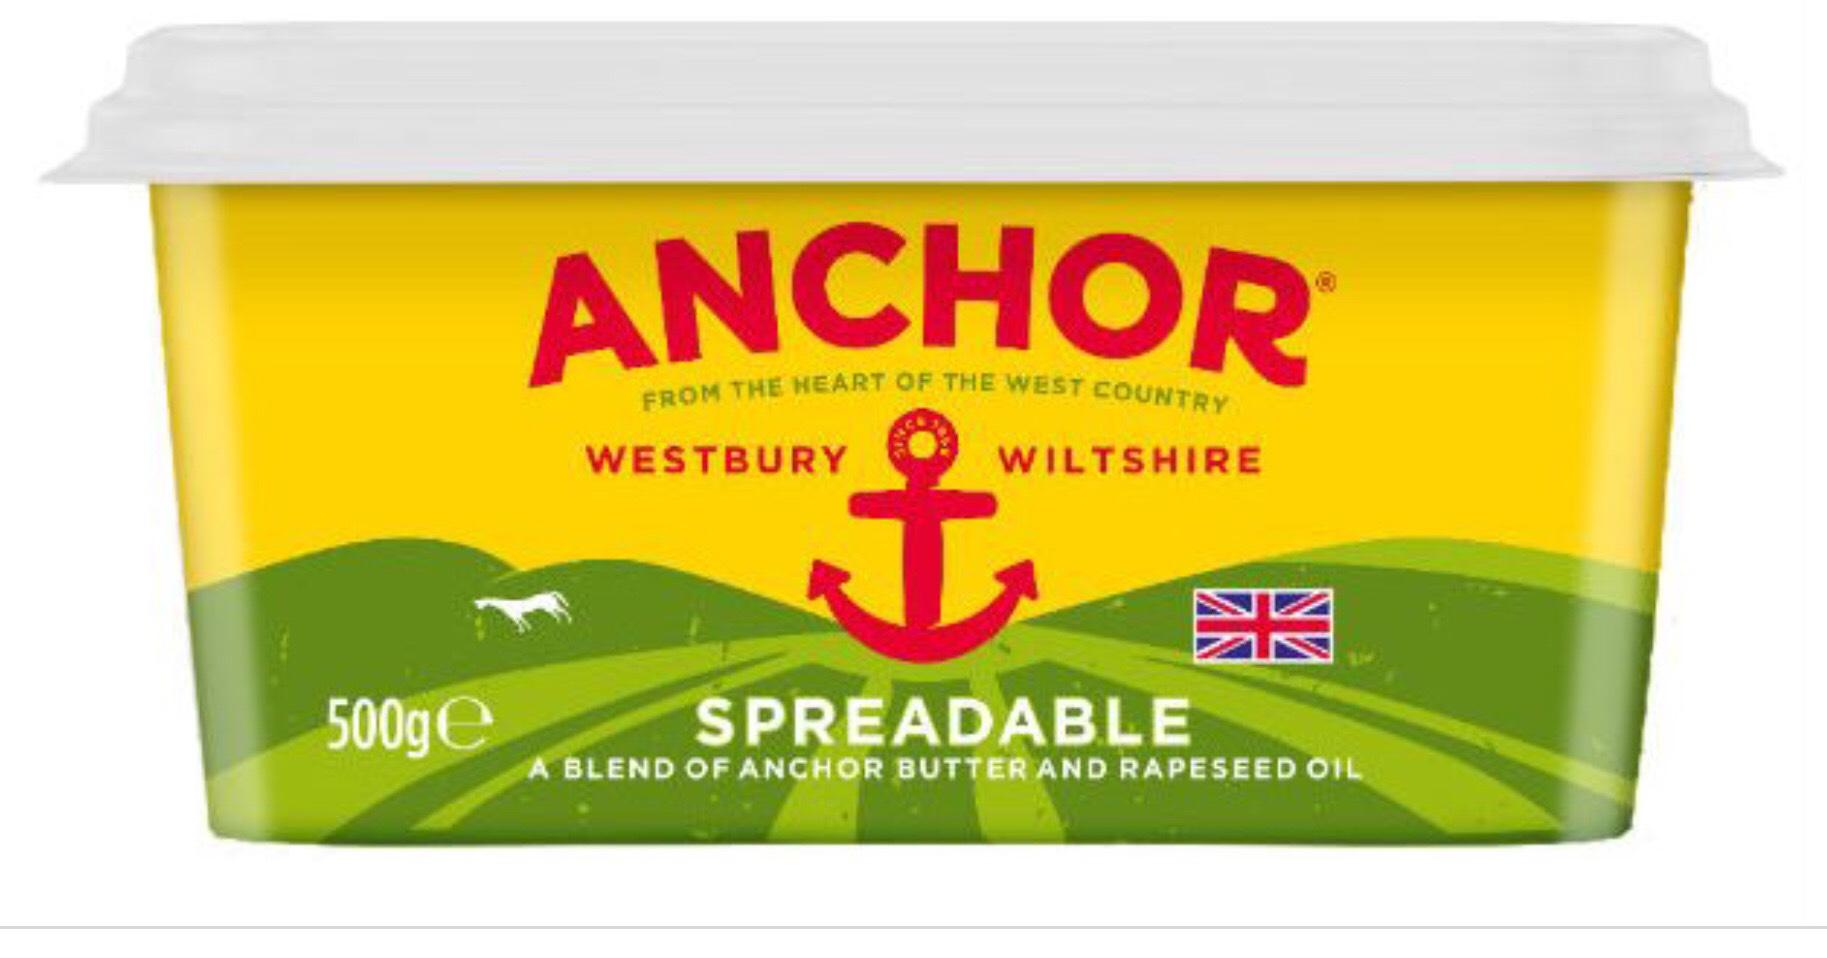 [Rollback] Anchor Spreadable - 500g - £2 at Asda